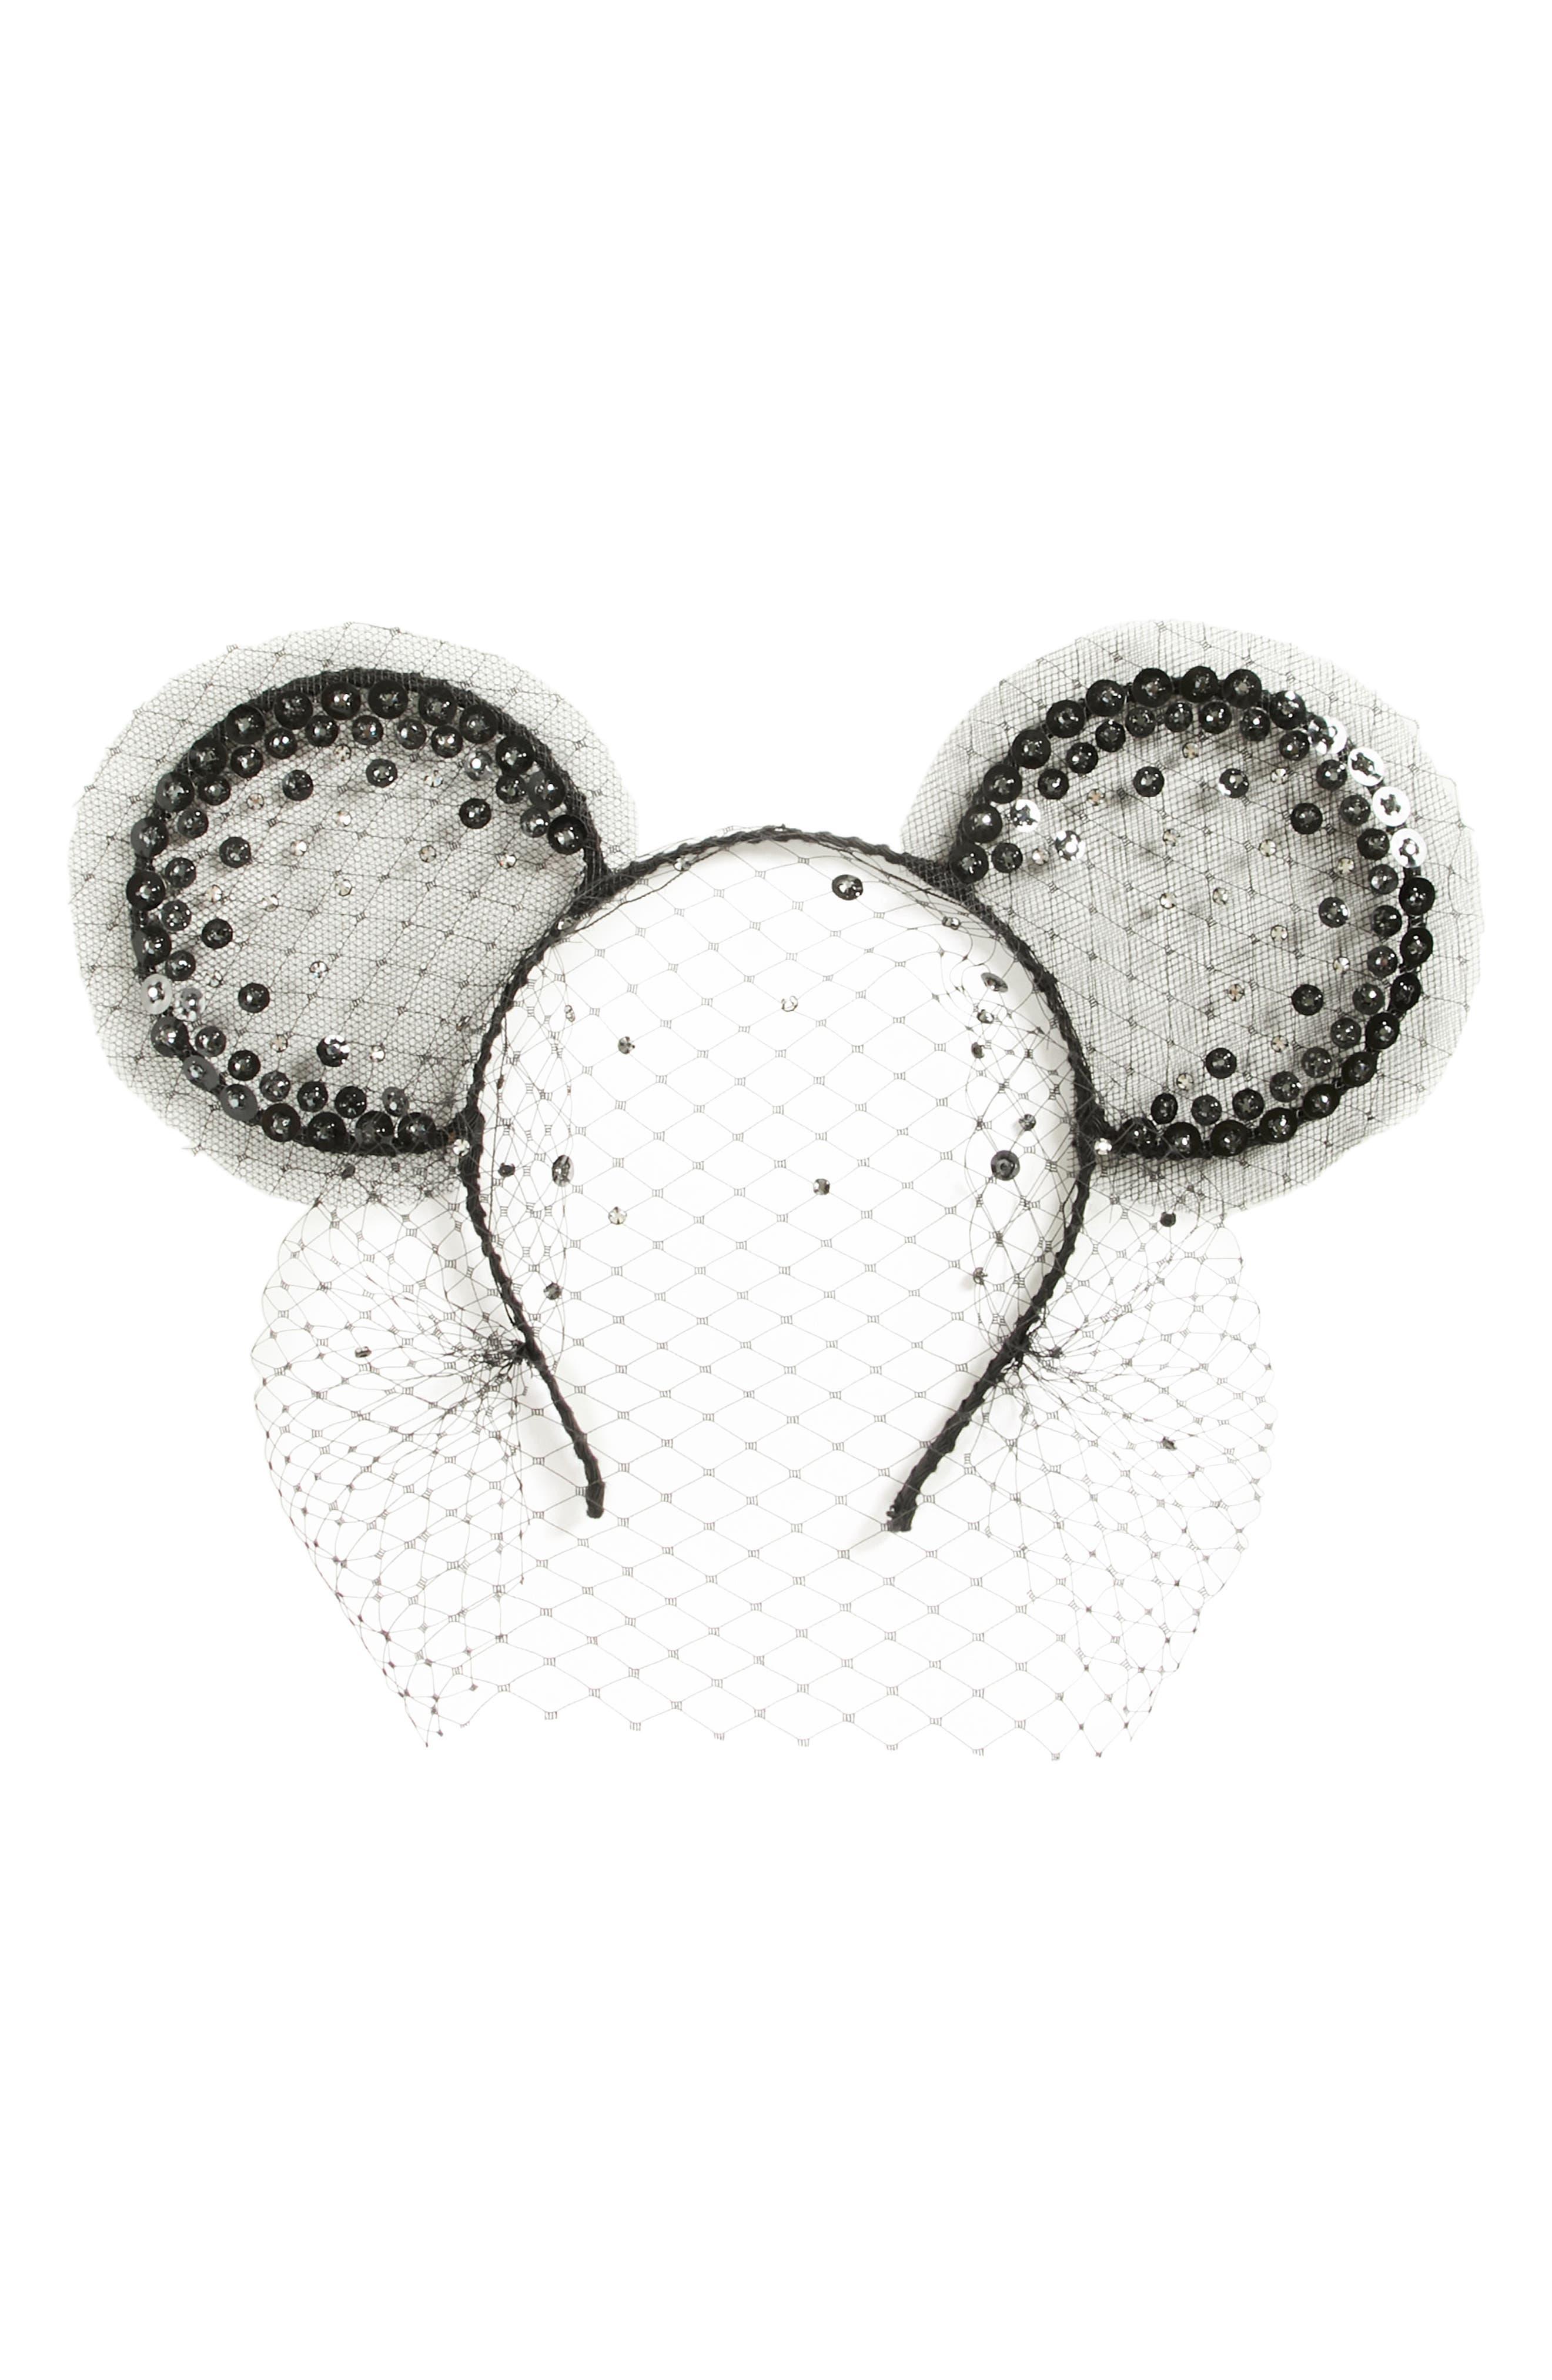 x Disney Mickey Magic Moment Midnight Veil  Headband,                             Main thumbnail 1, color,                             BLACK